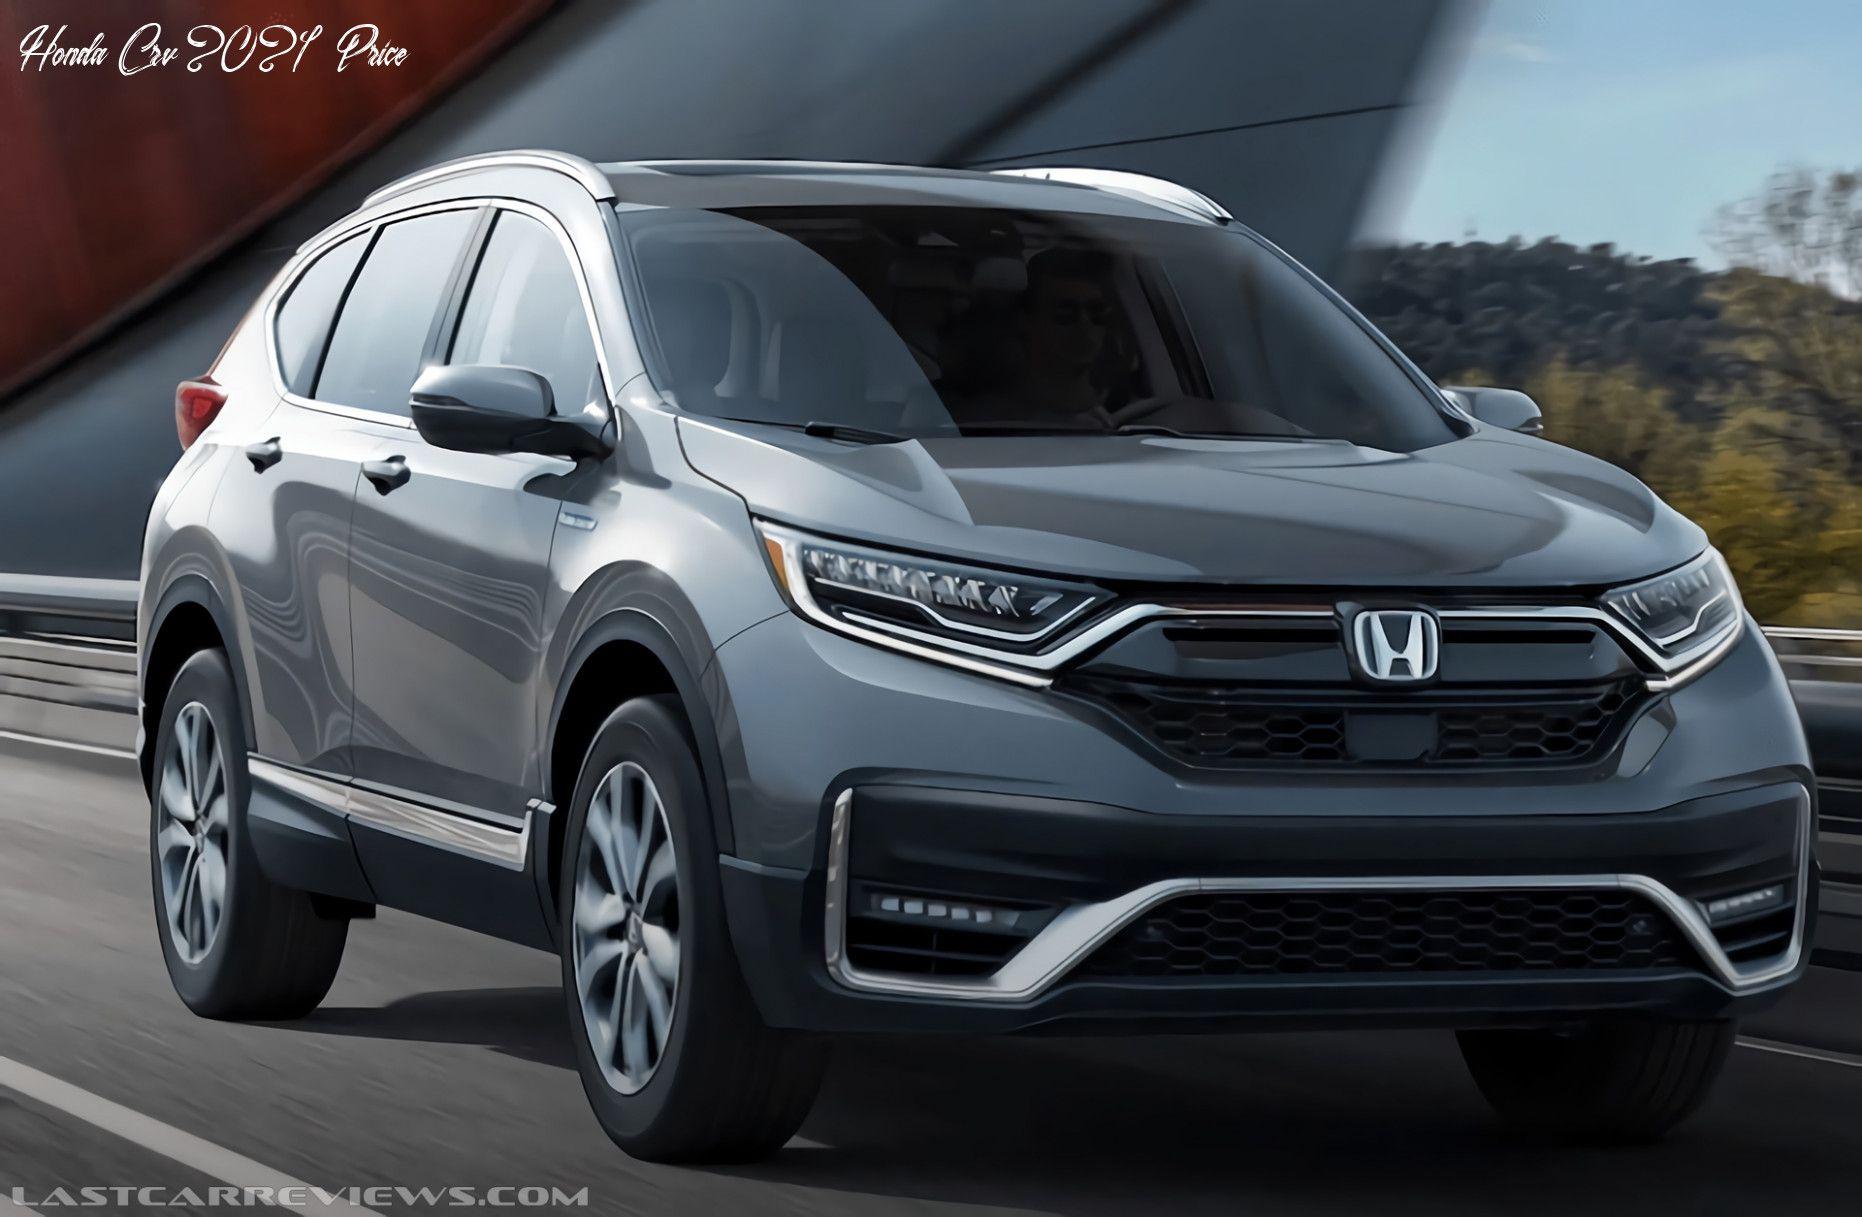 Honda Crv 2021 Price Spesification In 2020 Honda Crv Hybrid Honda Crv Honda Cr